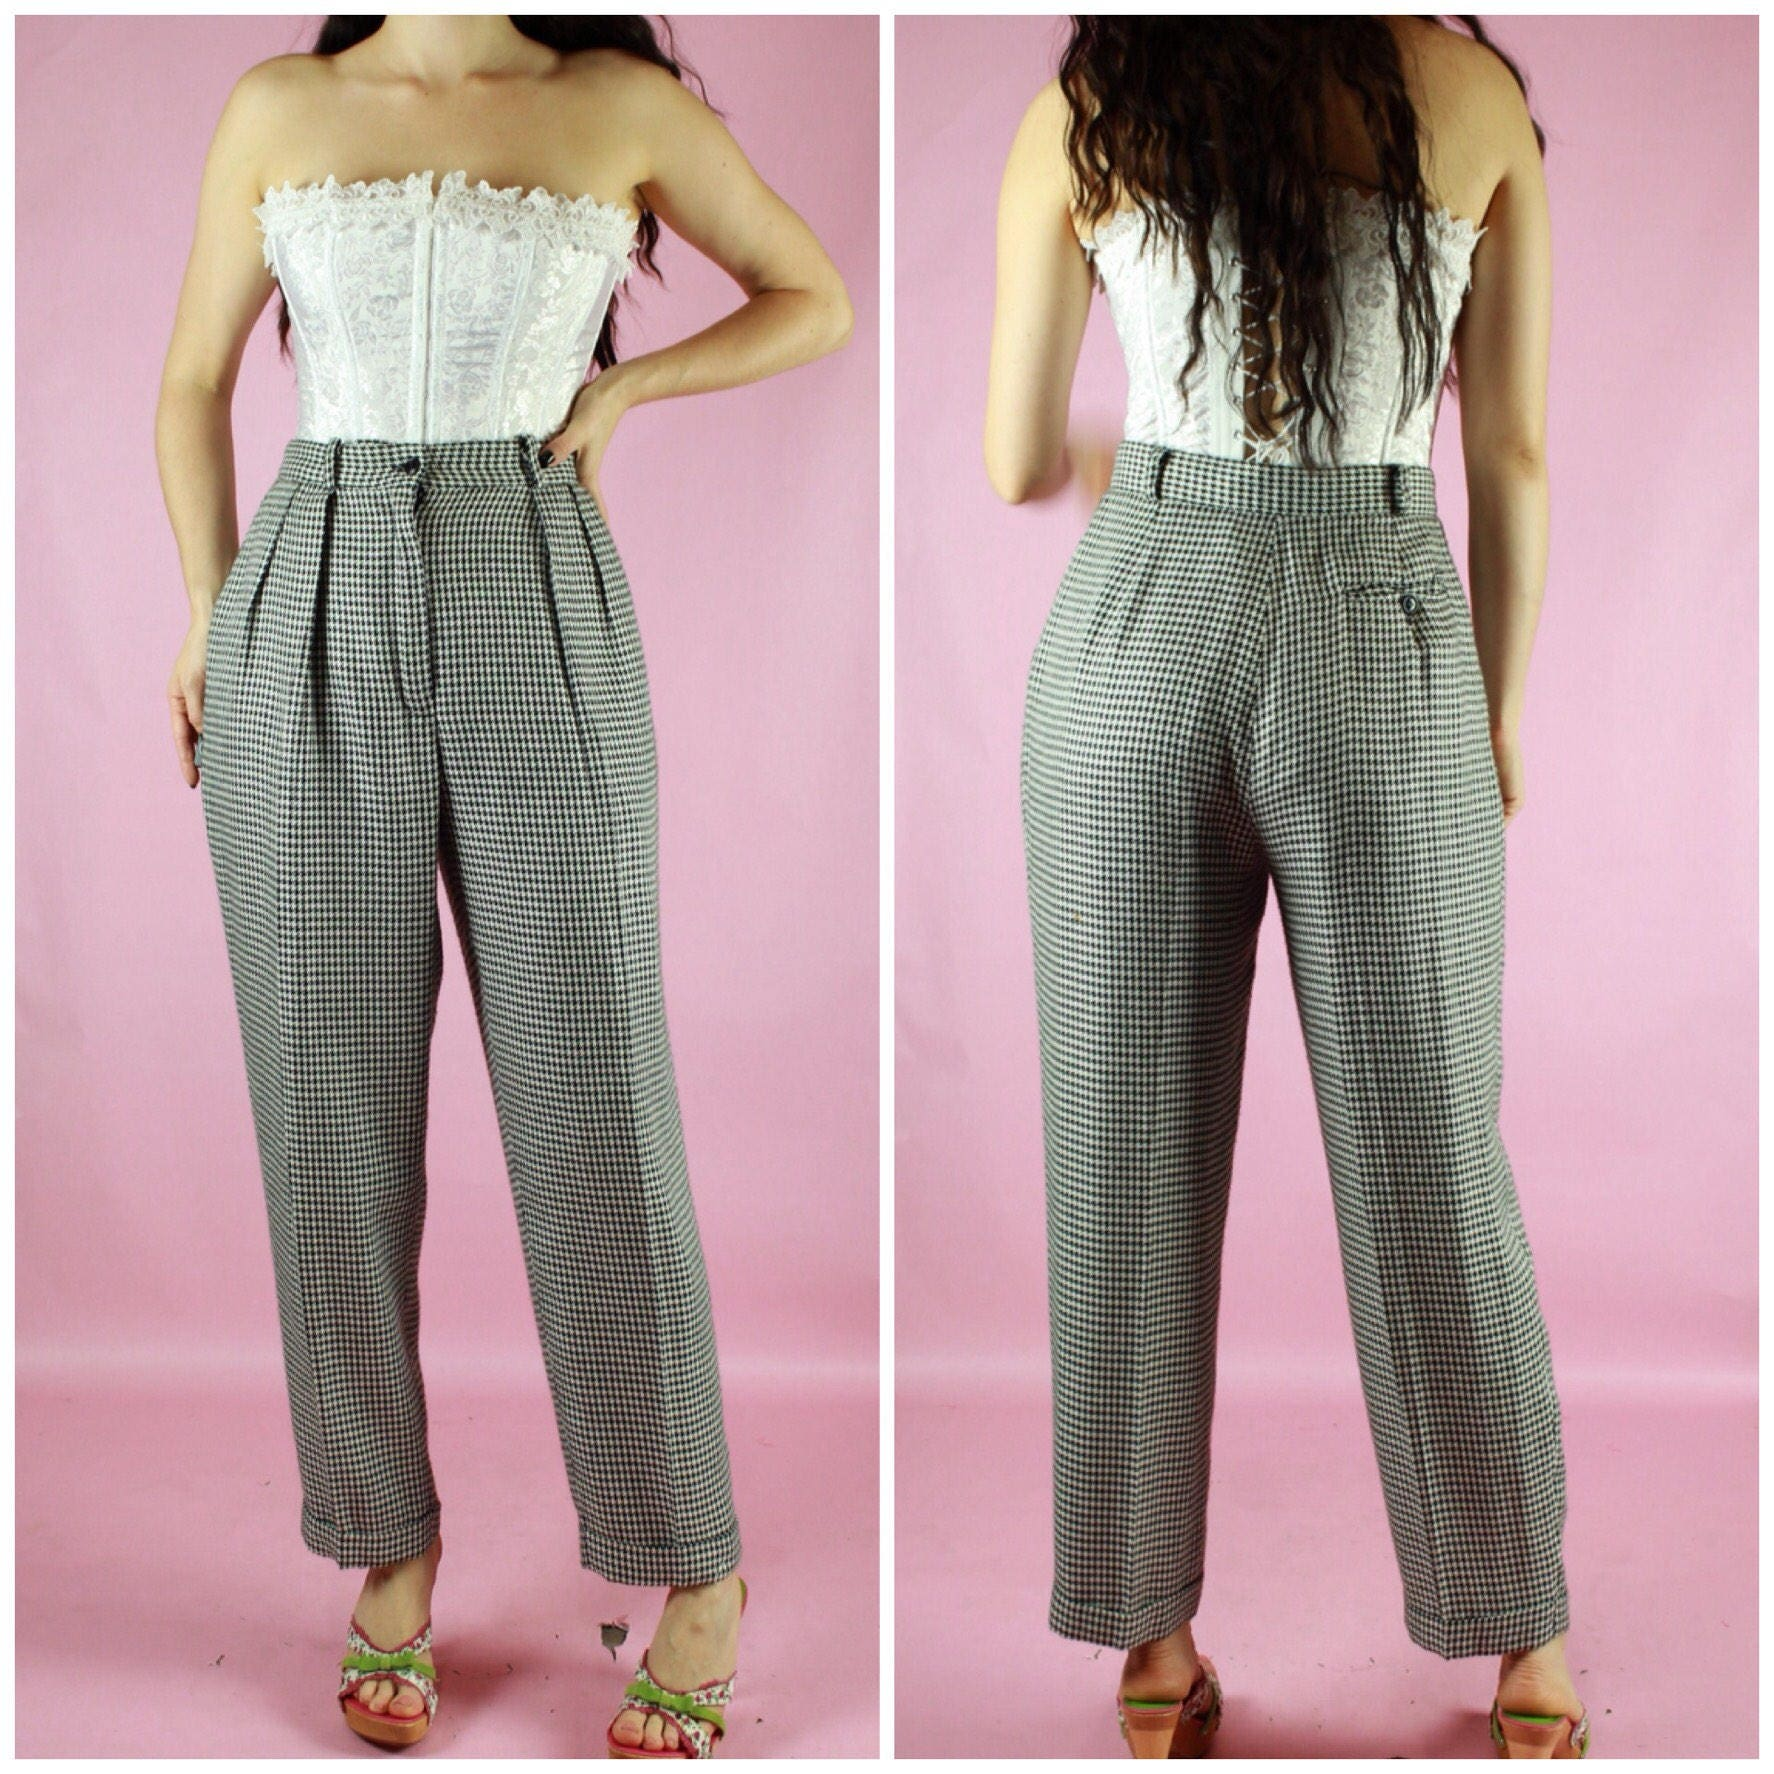 Vintage 70s 80s Jade Workwear Houndstooth Trousers